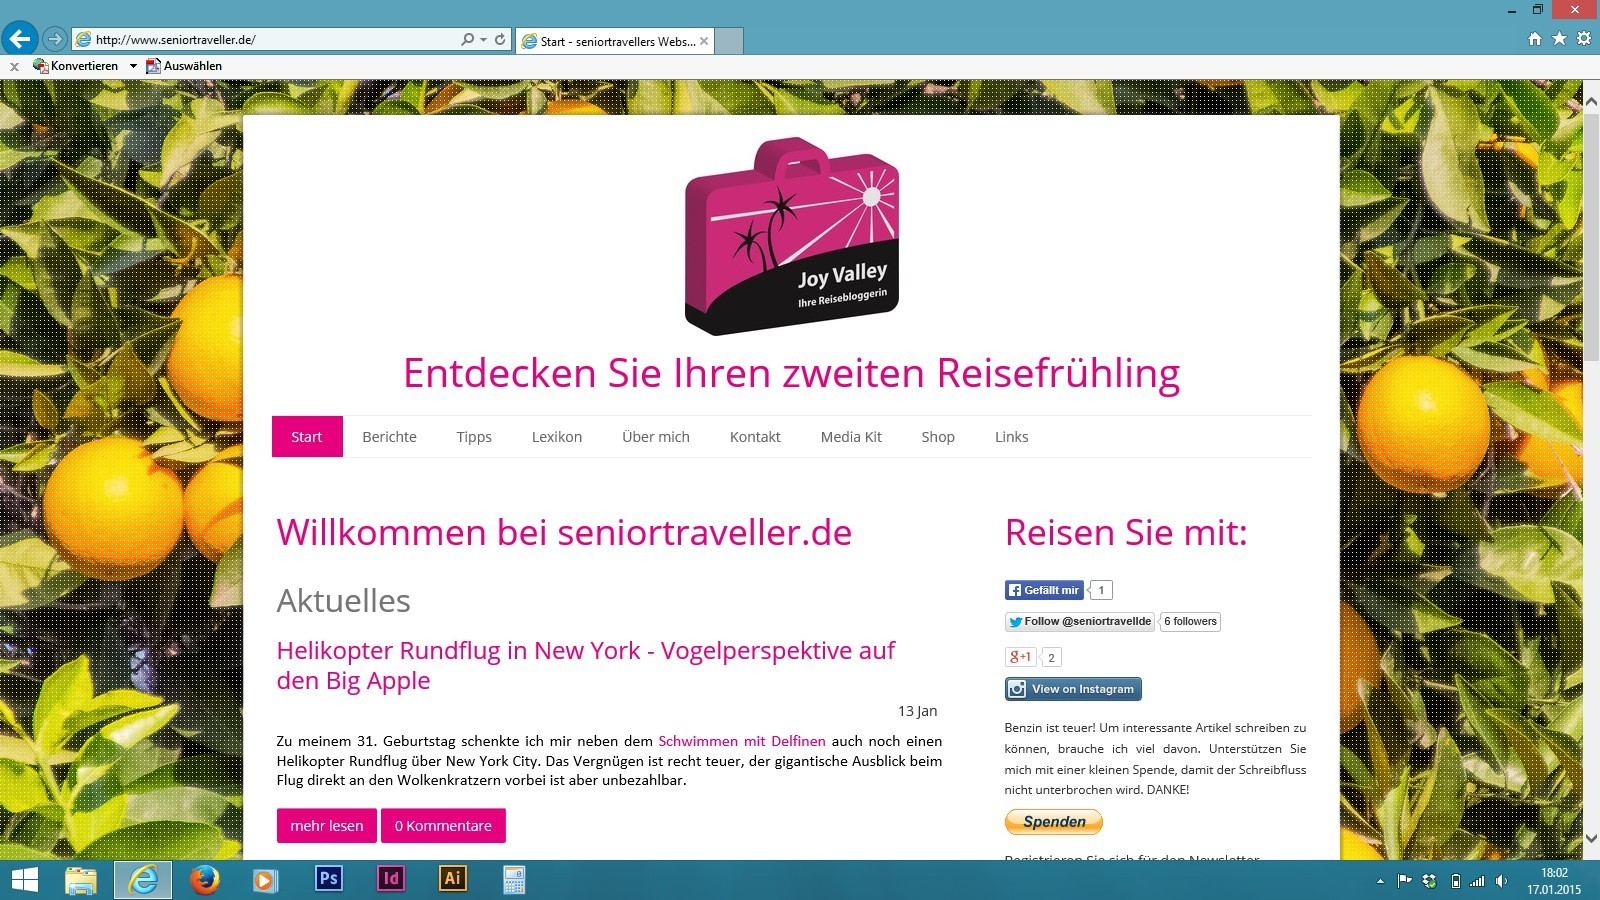 Startseite seniortraveller.de